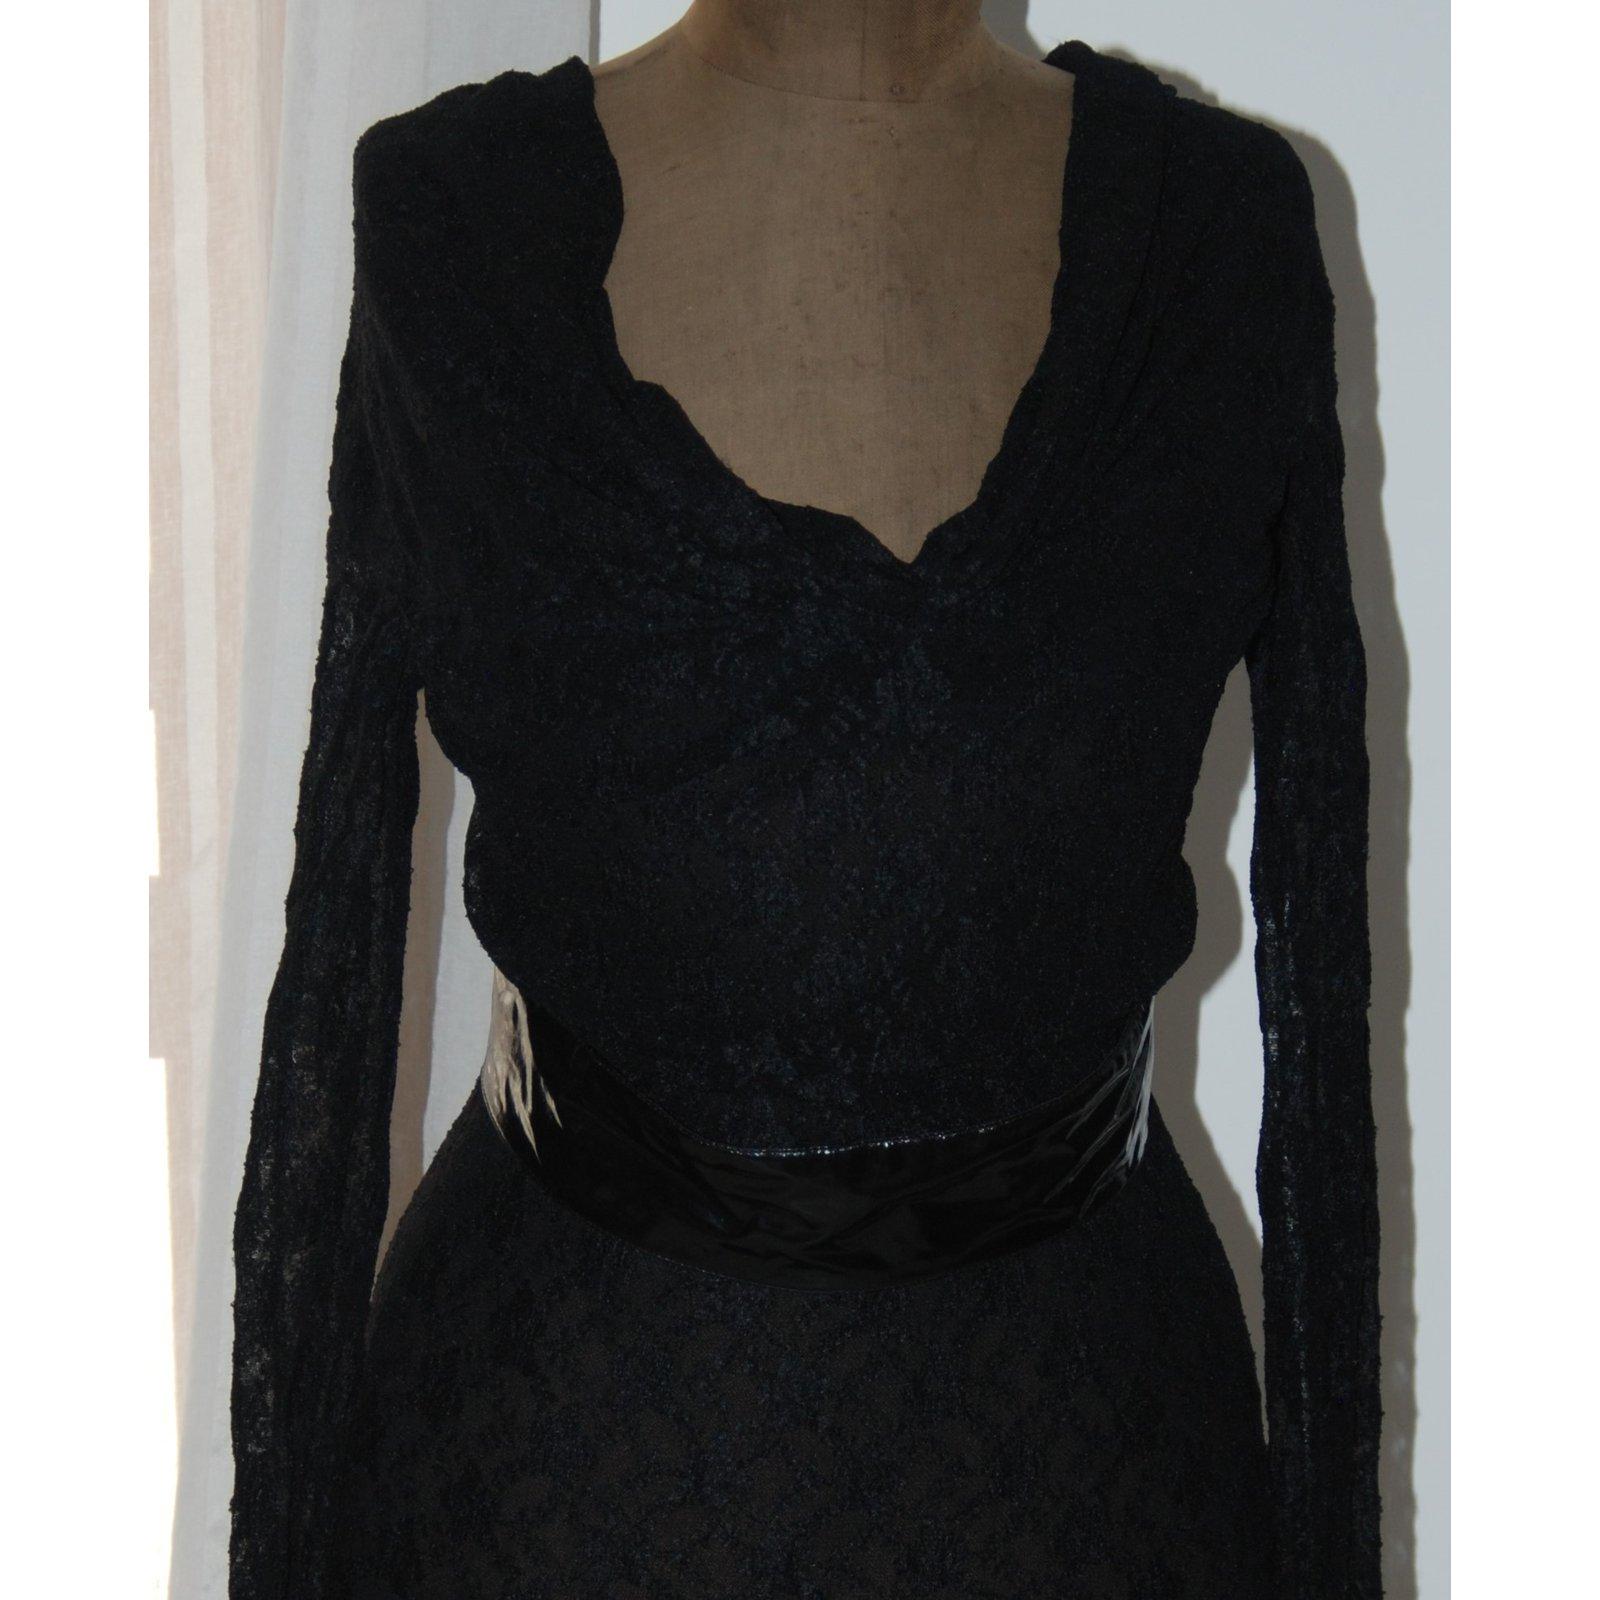 21f7452ba21 Dolce   Gabbana Dresses Dresses Lace Black ref.78489 - Joli Closet